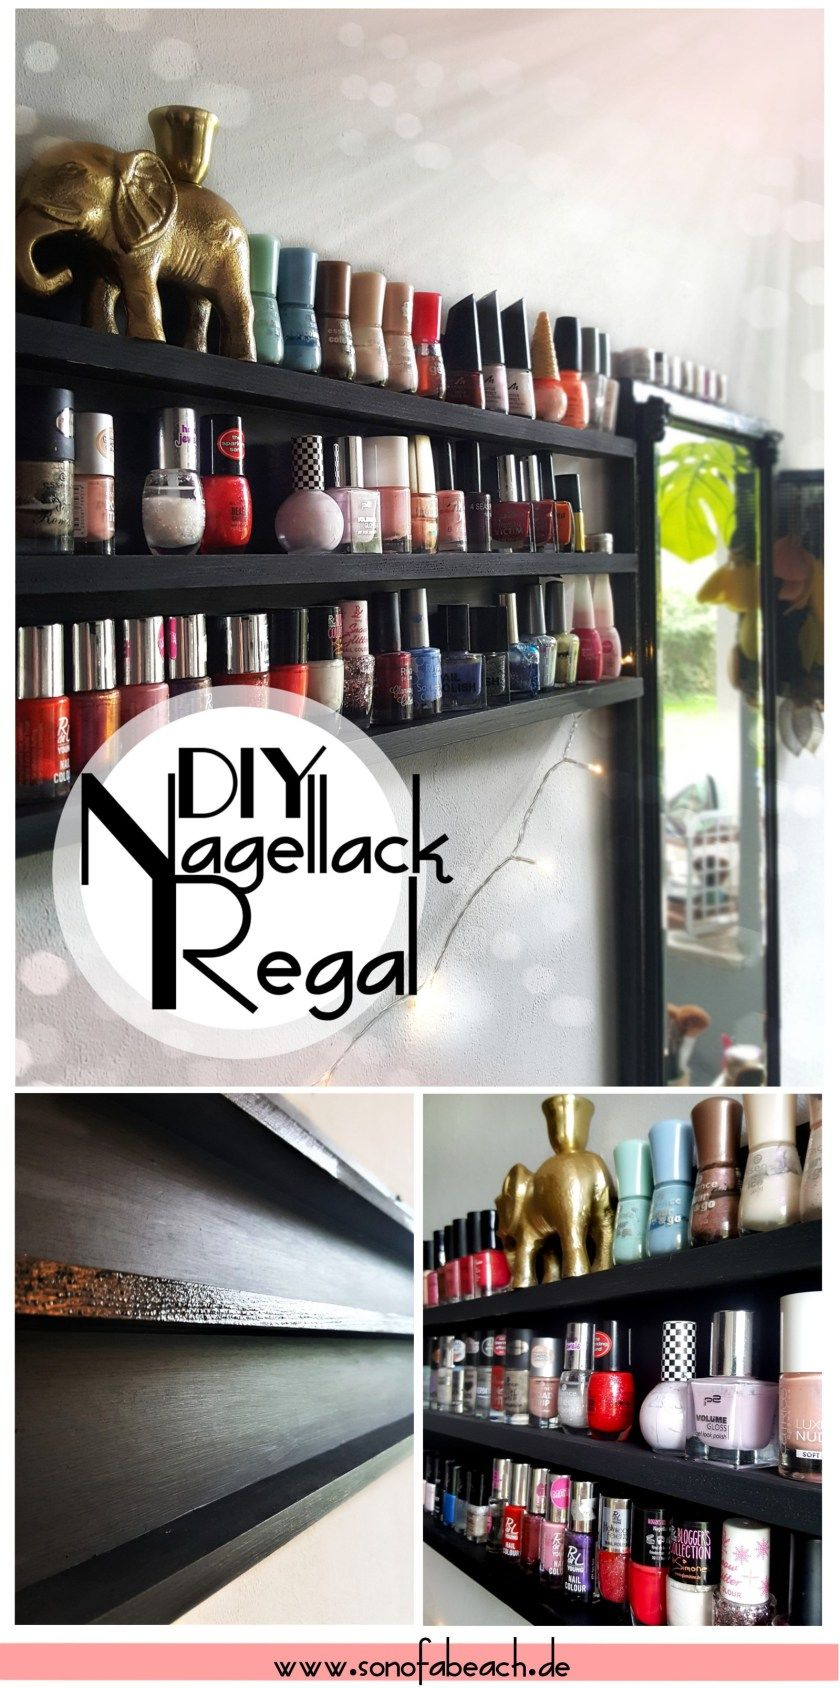 diy nagellack regal einfach und g nstig selber bauen diy dekoration home decor. Black Bedroom Furniture Sets. Home Design Ideas